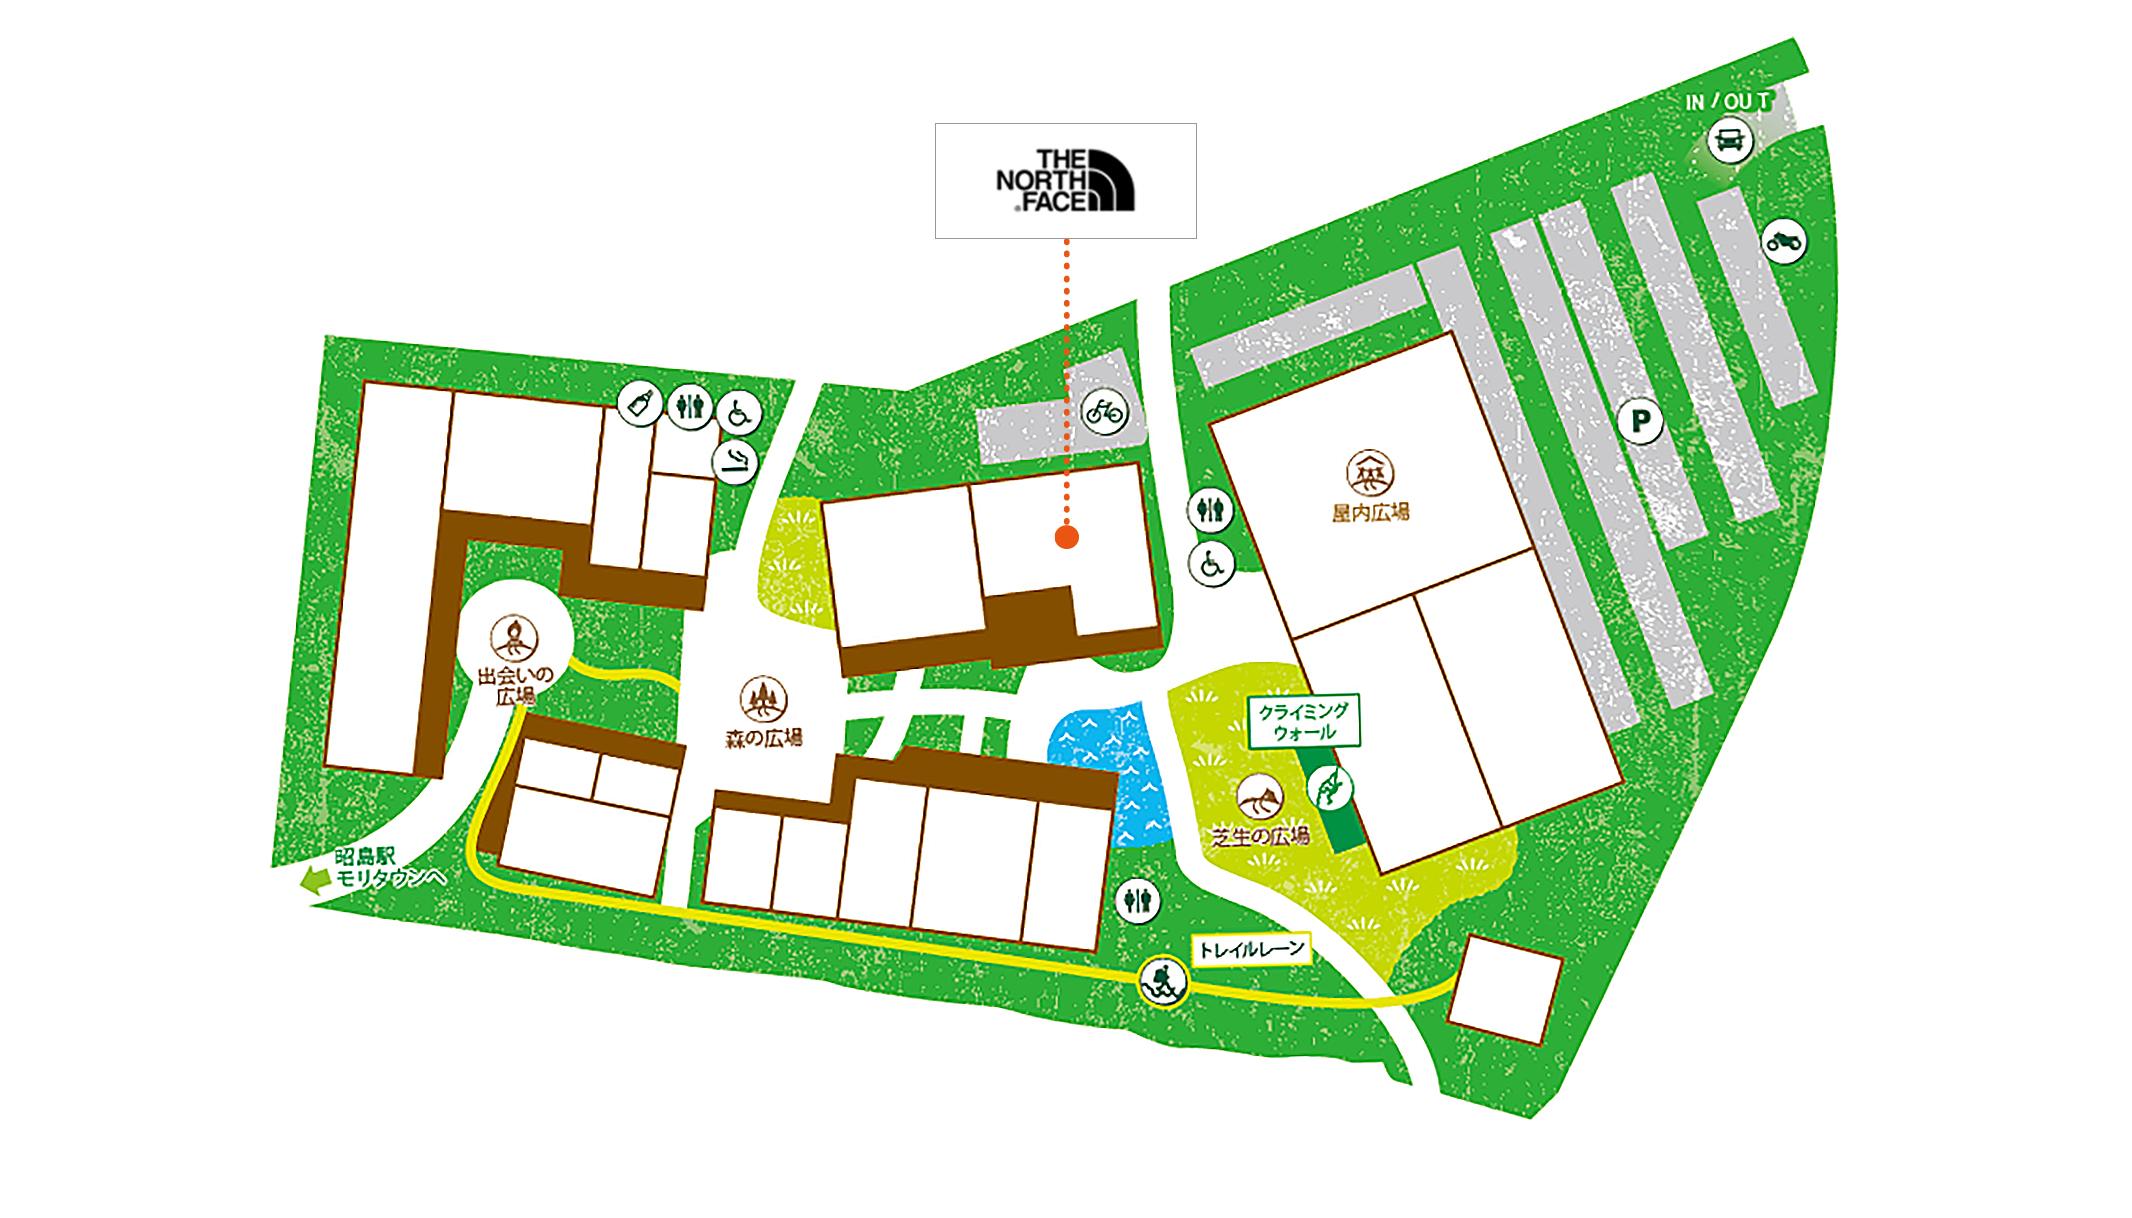 THE NORTH FACE 昭島アウトドアヴィレッジ店map